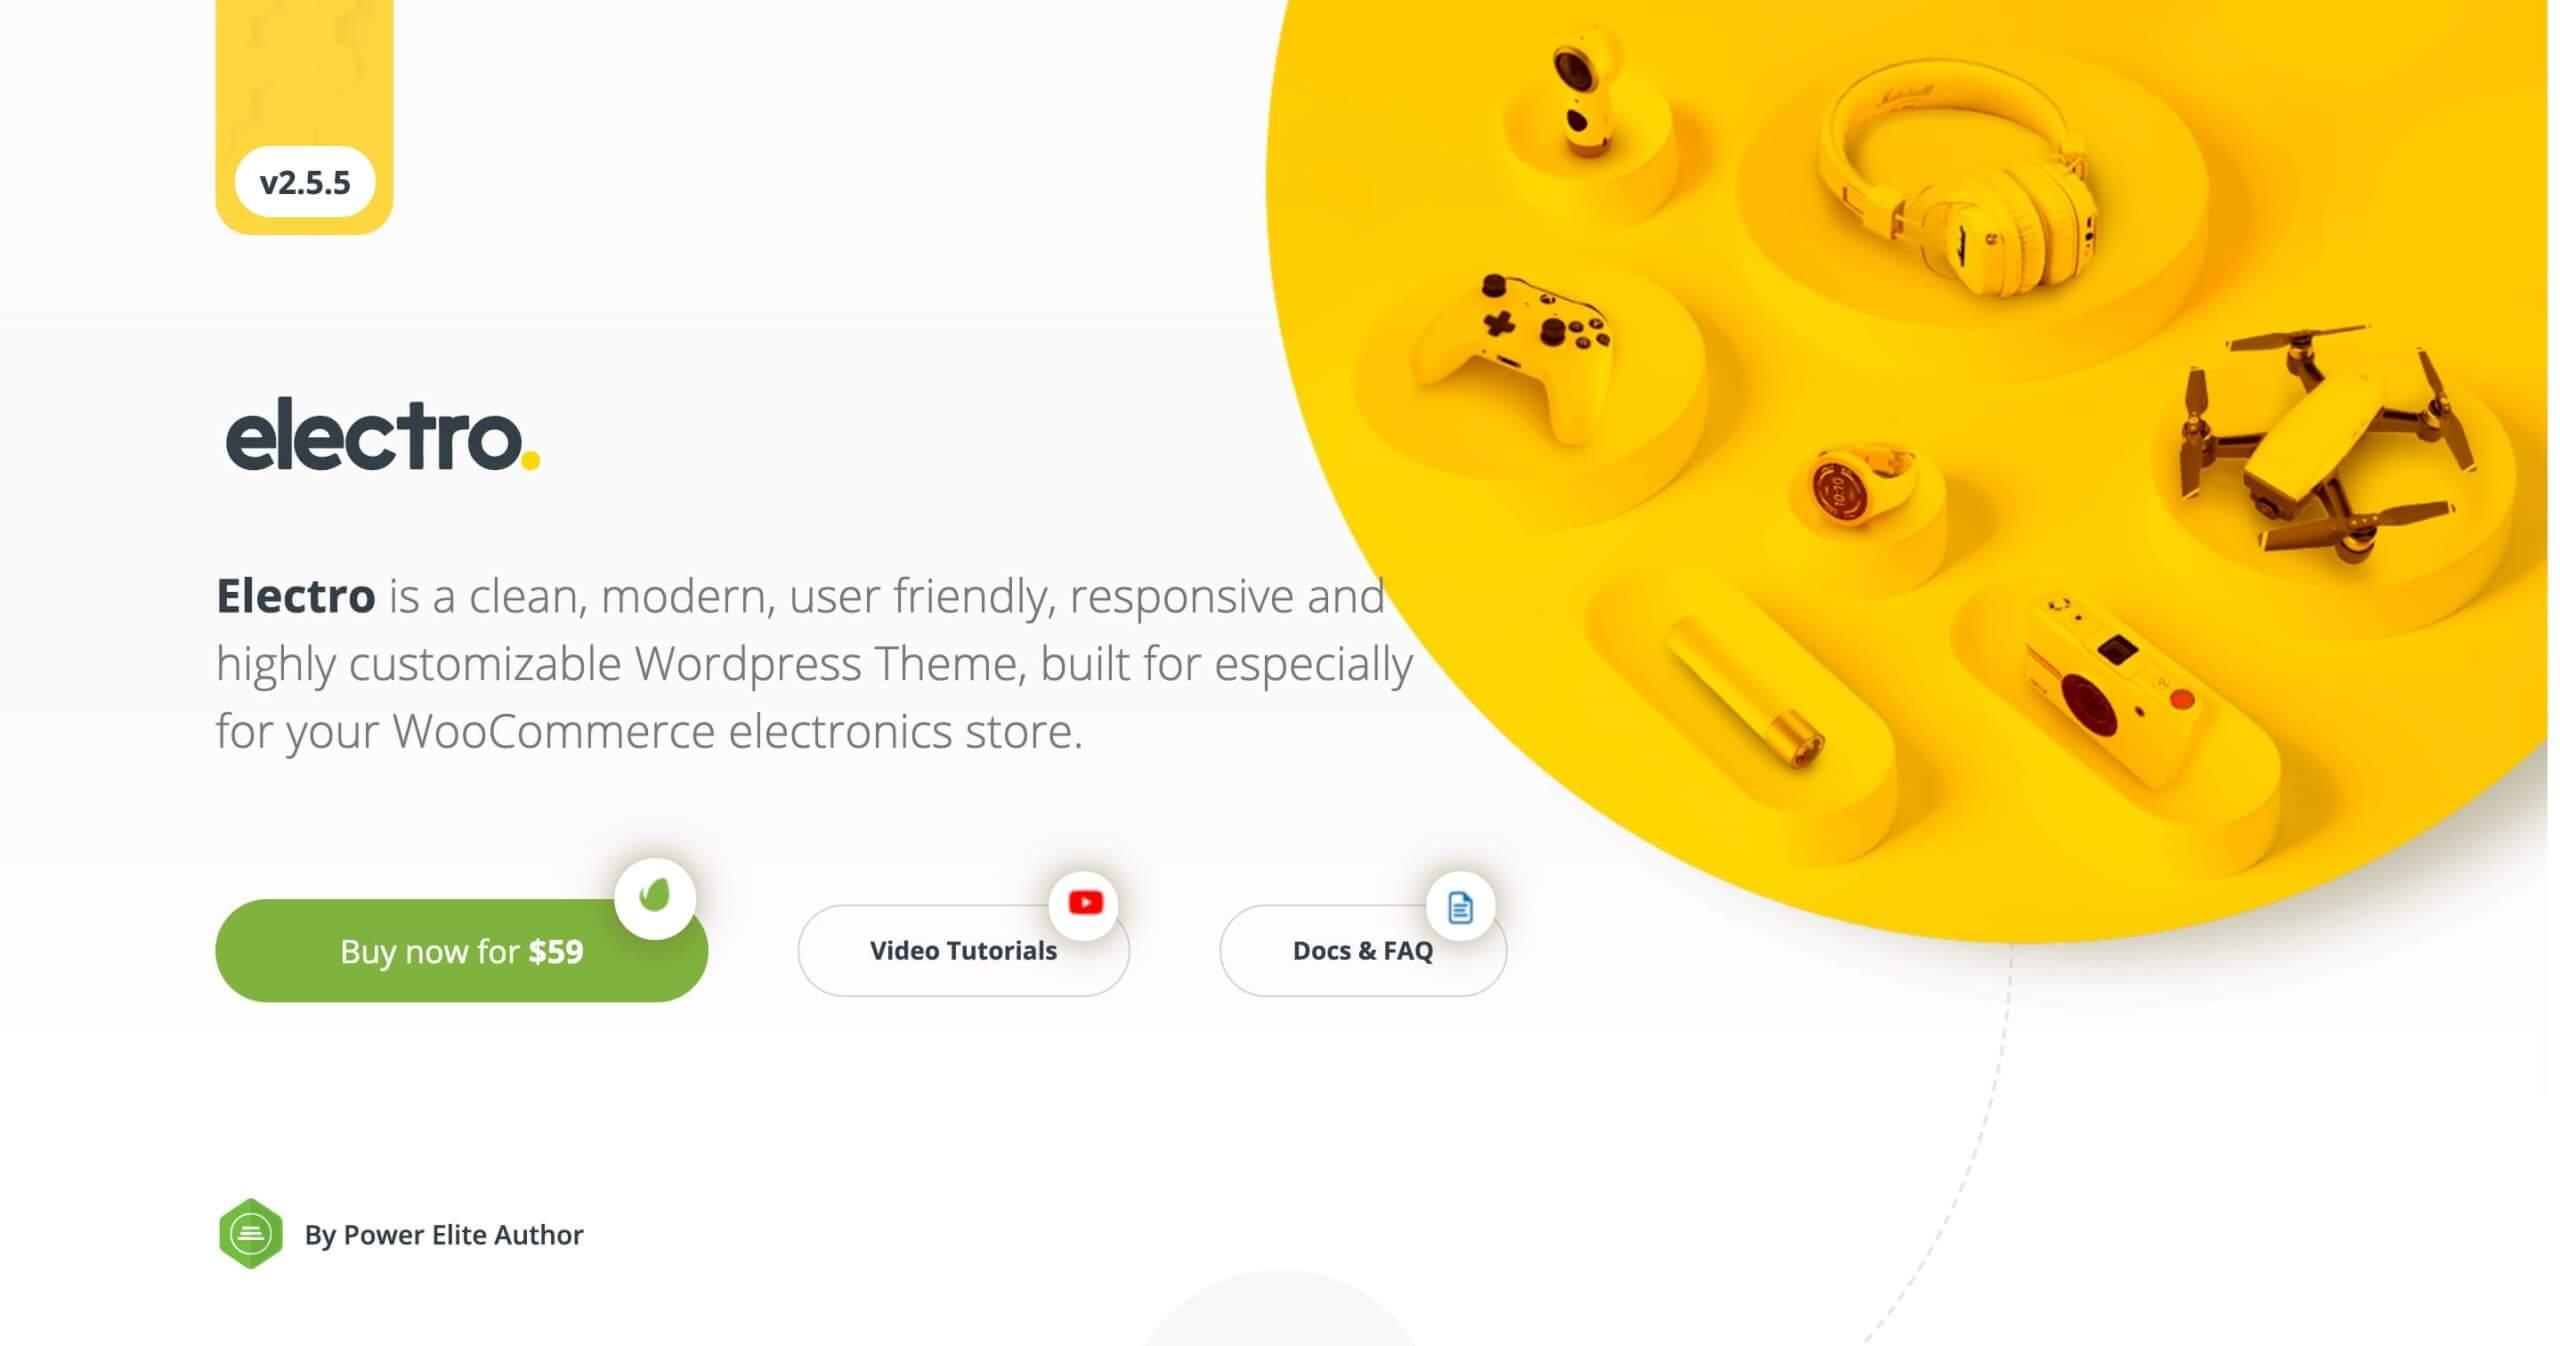 best woocommerce theme, best woocommerce theme for ecommerce, free woocommerce theme, woocommerce theme, woocommerce theme free